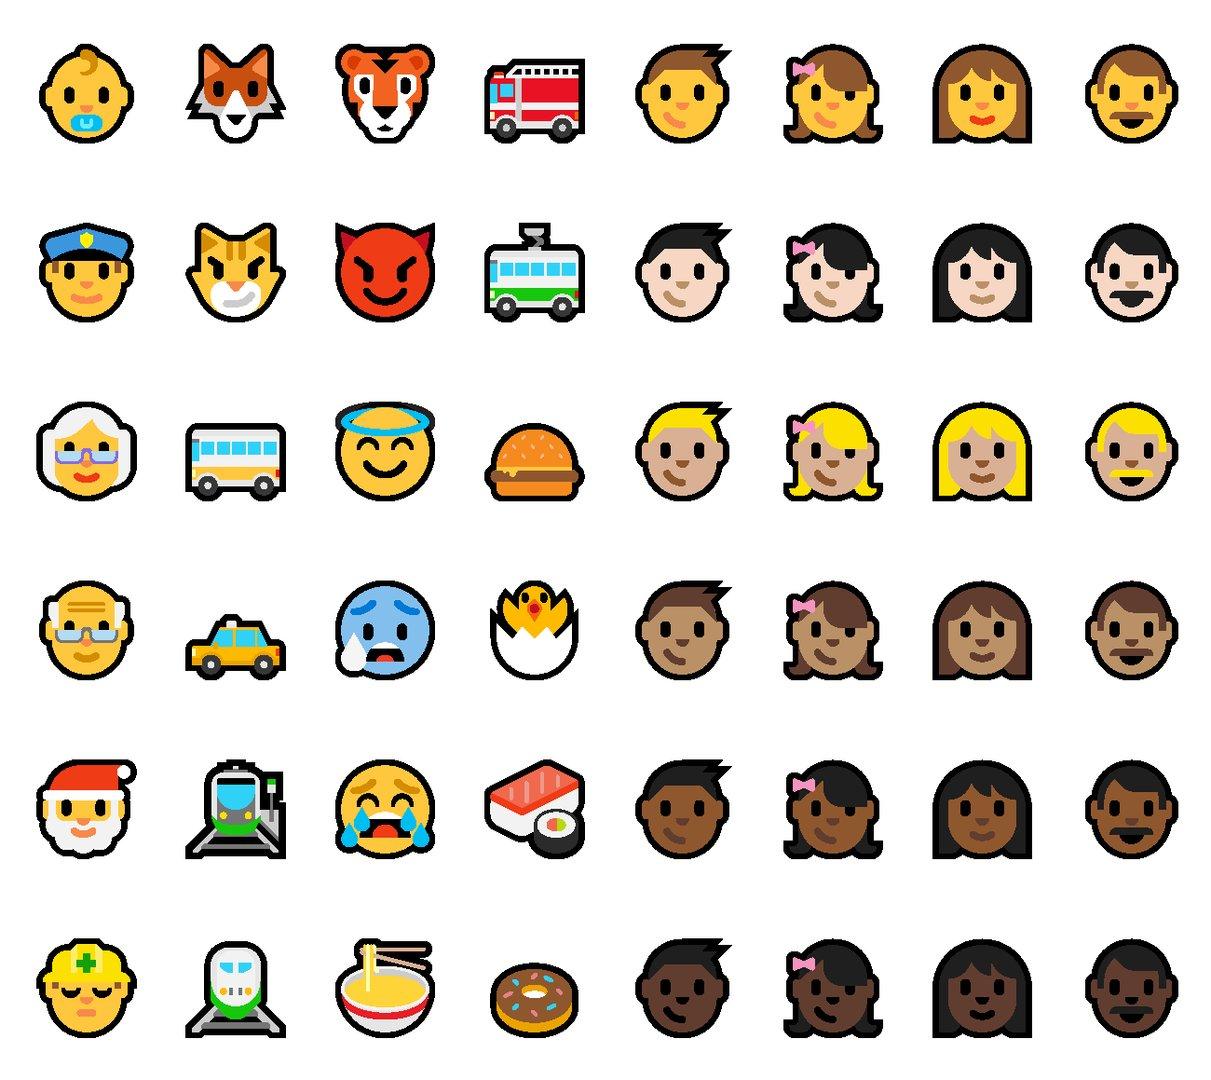 Überarbeitetes Emoji-Design